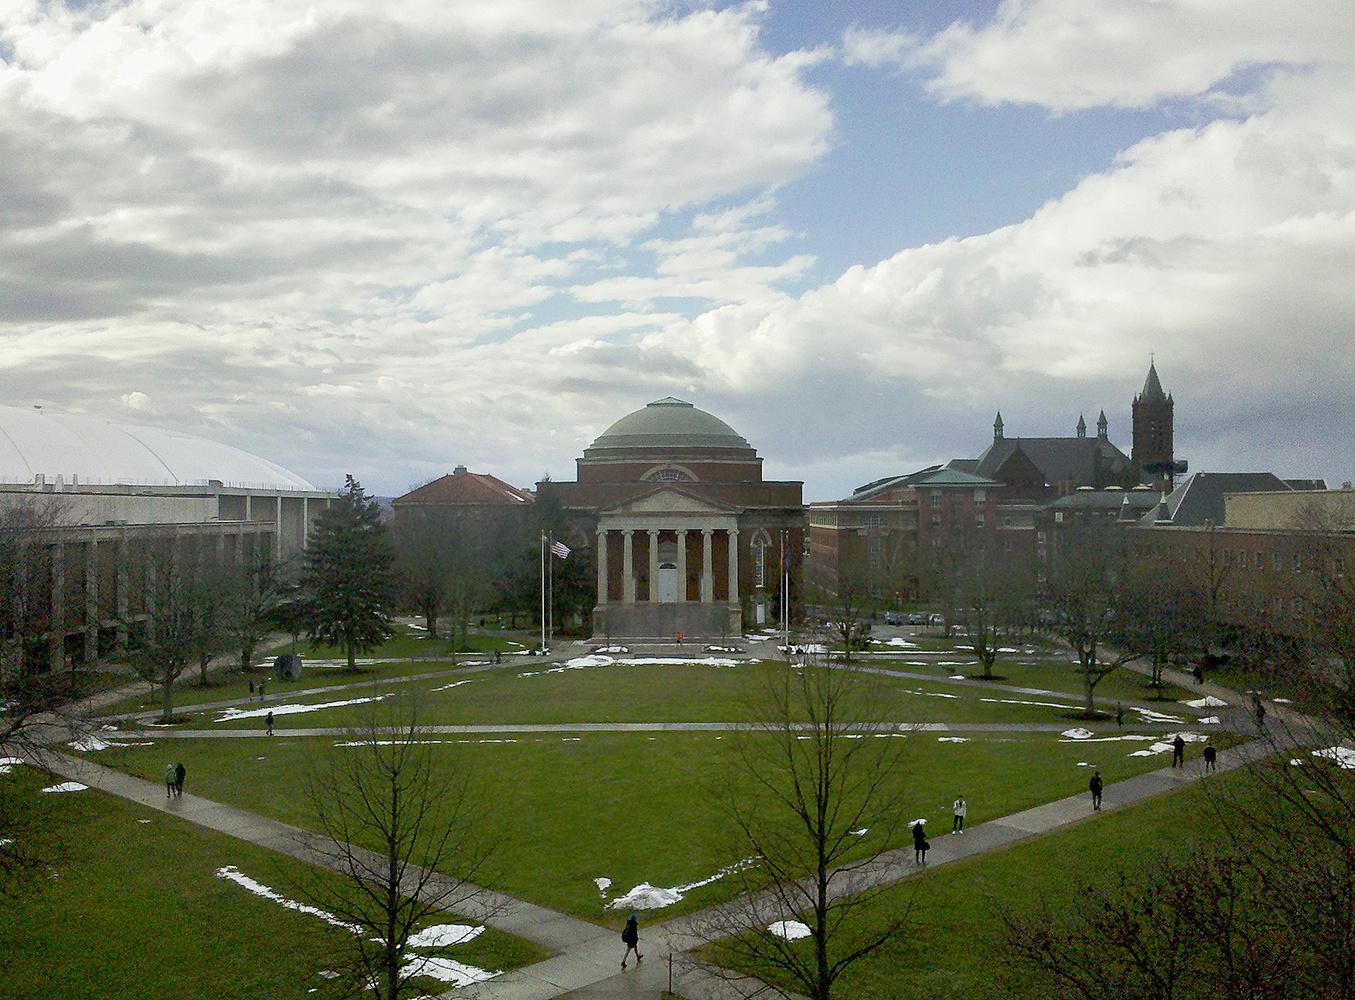 Motorola Droid photo of Syracuse University